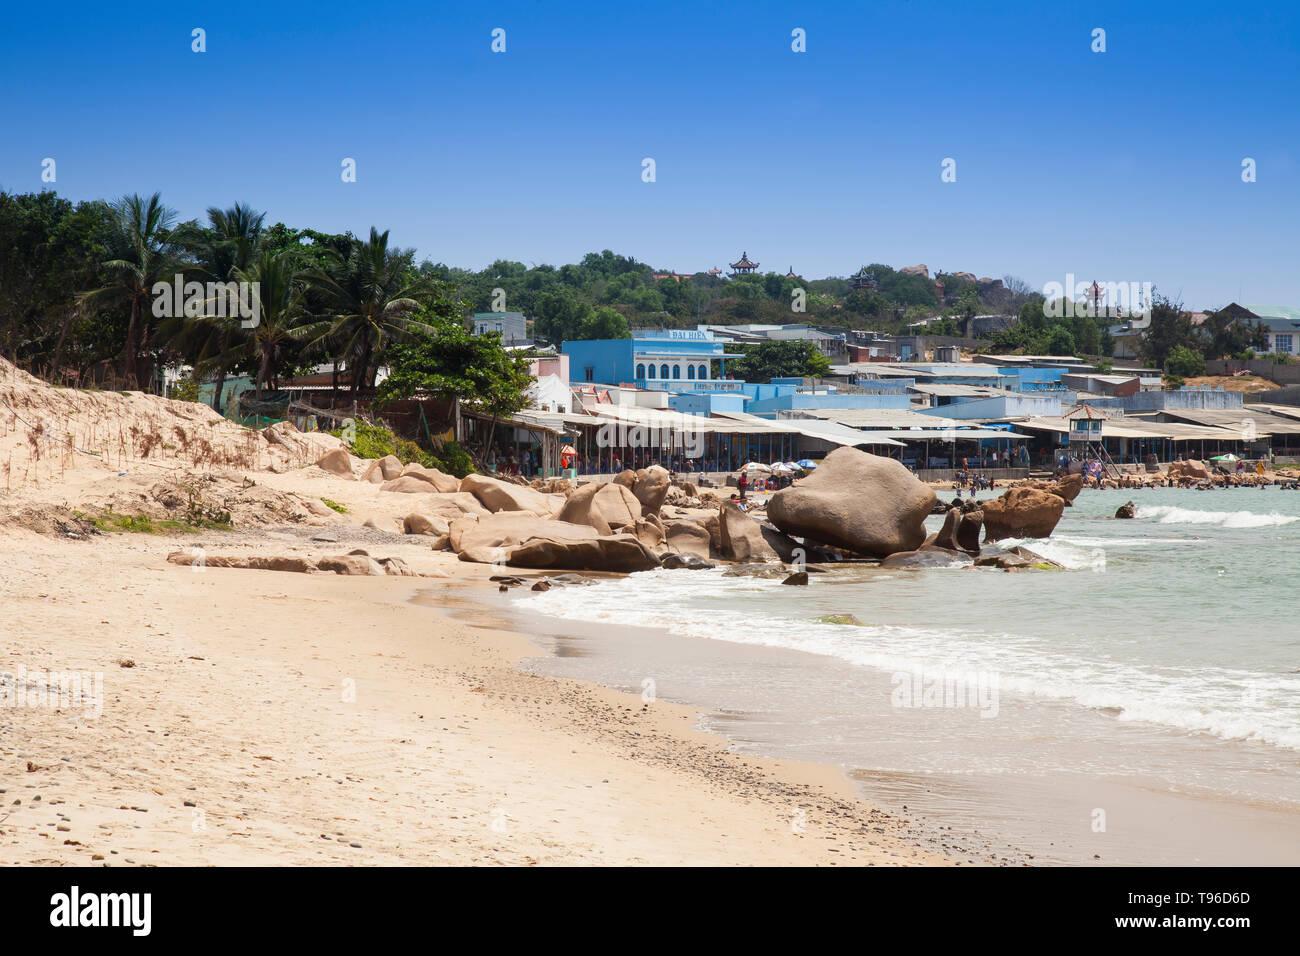 Natural beach near Mui Ne, south china sea,Vietnam,asia - Stock Image